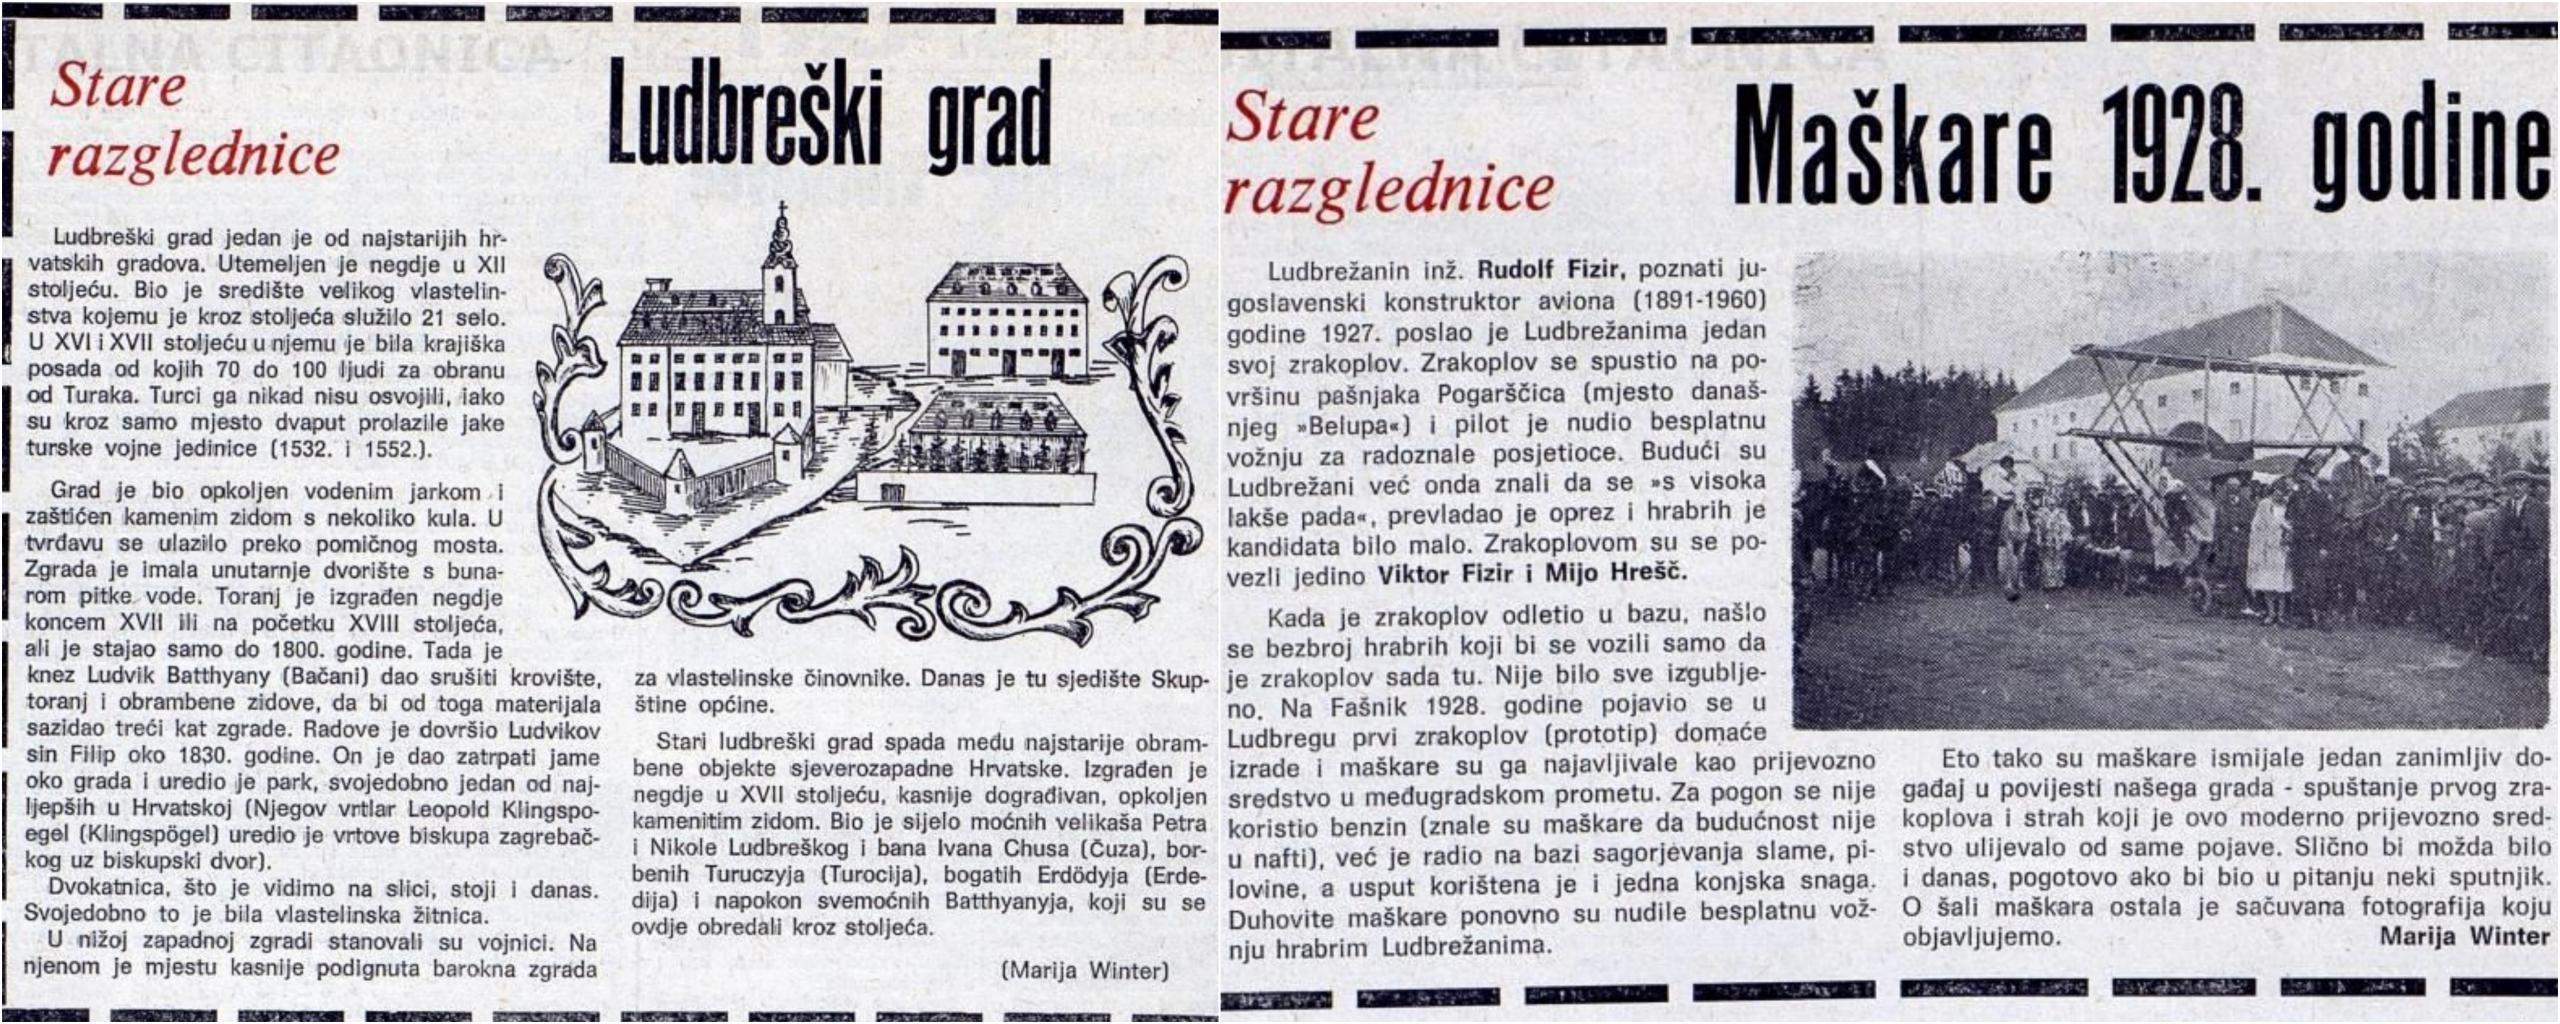 Tekstovi Marije Winter u Ludbreškom listu, 1982.